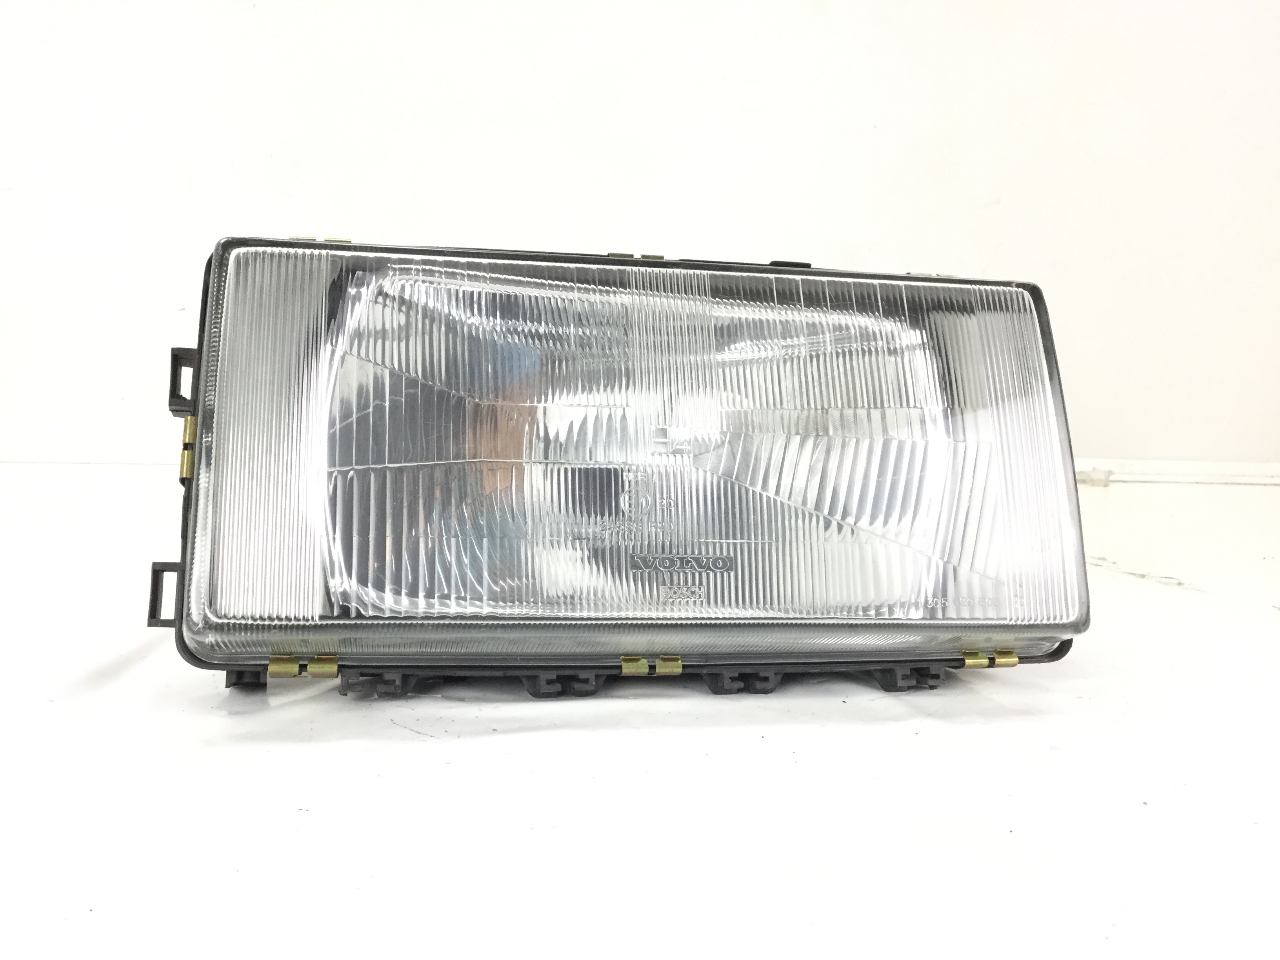 Volvo 940 944 960 964 Kombi 965 1988 On Headlamp Headlight Left Passenger Side